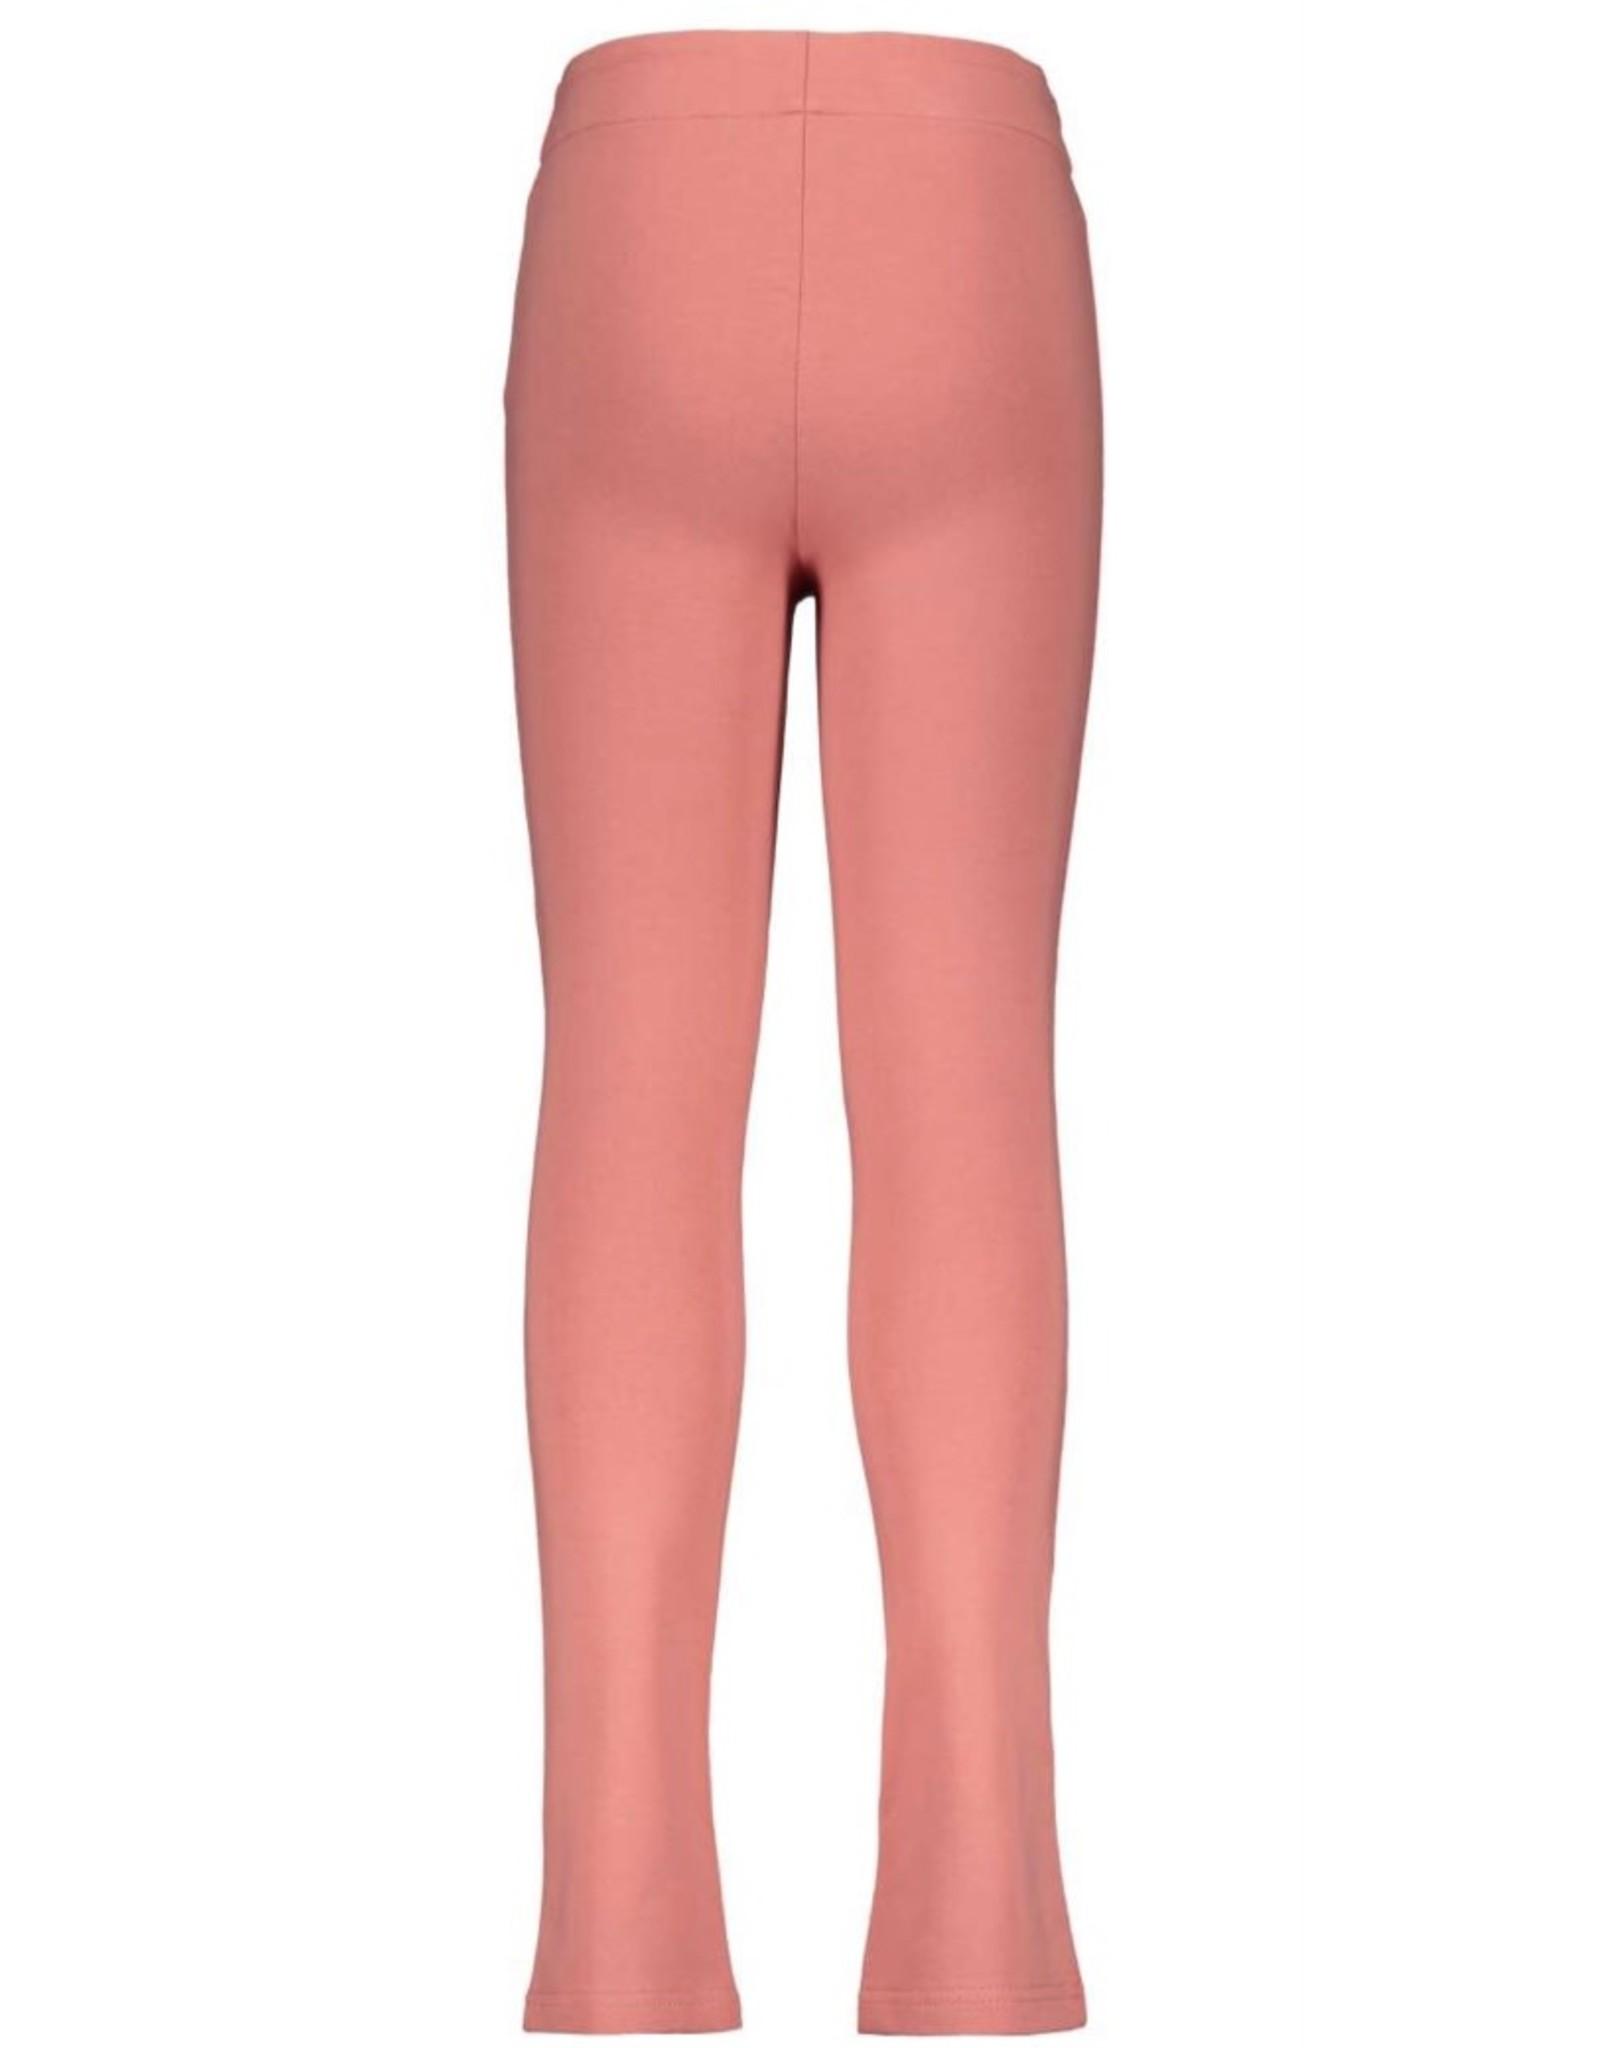 Flo F102-5612 Flared pants